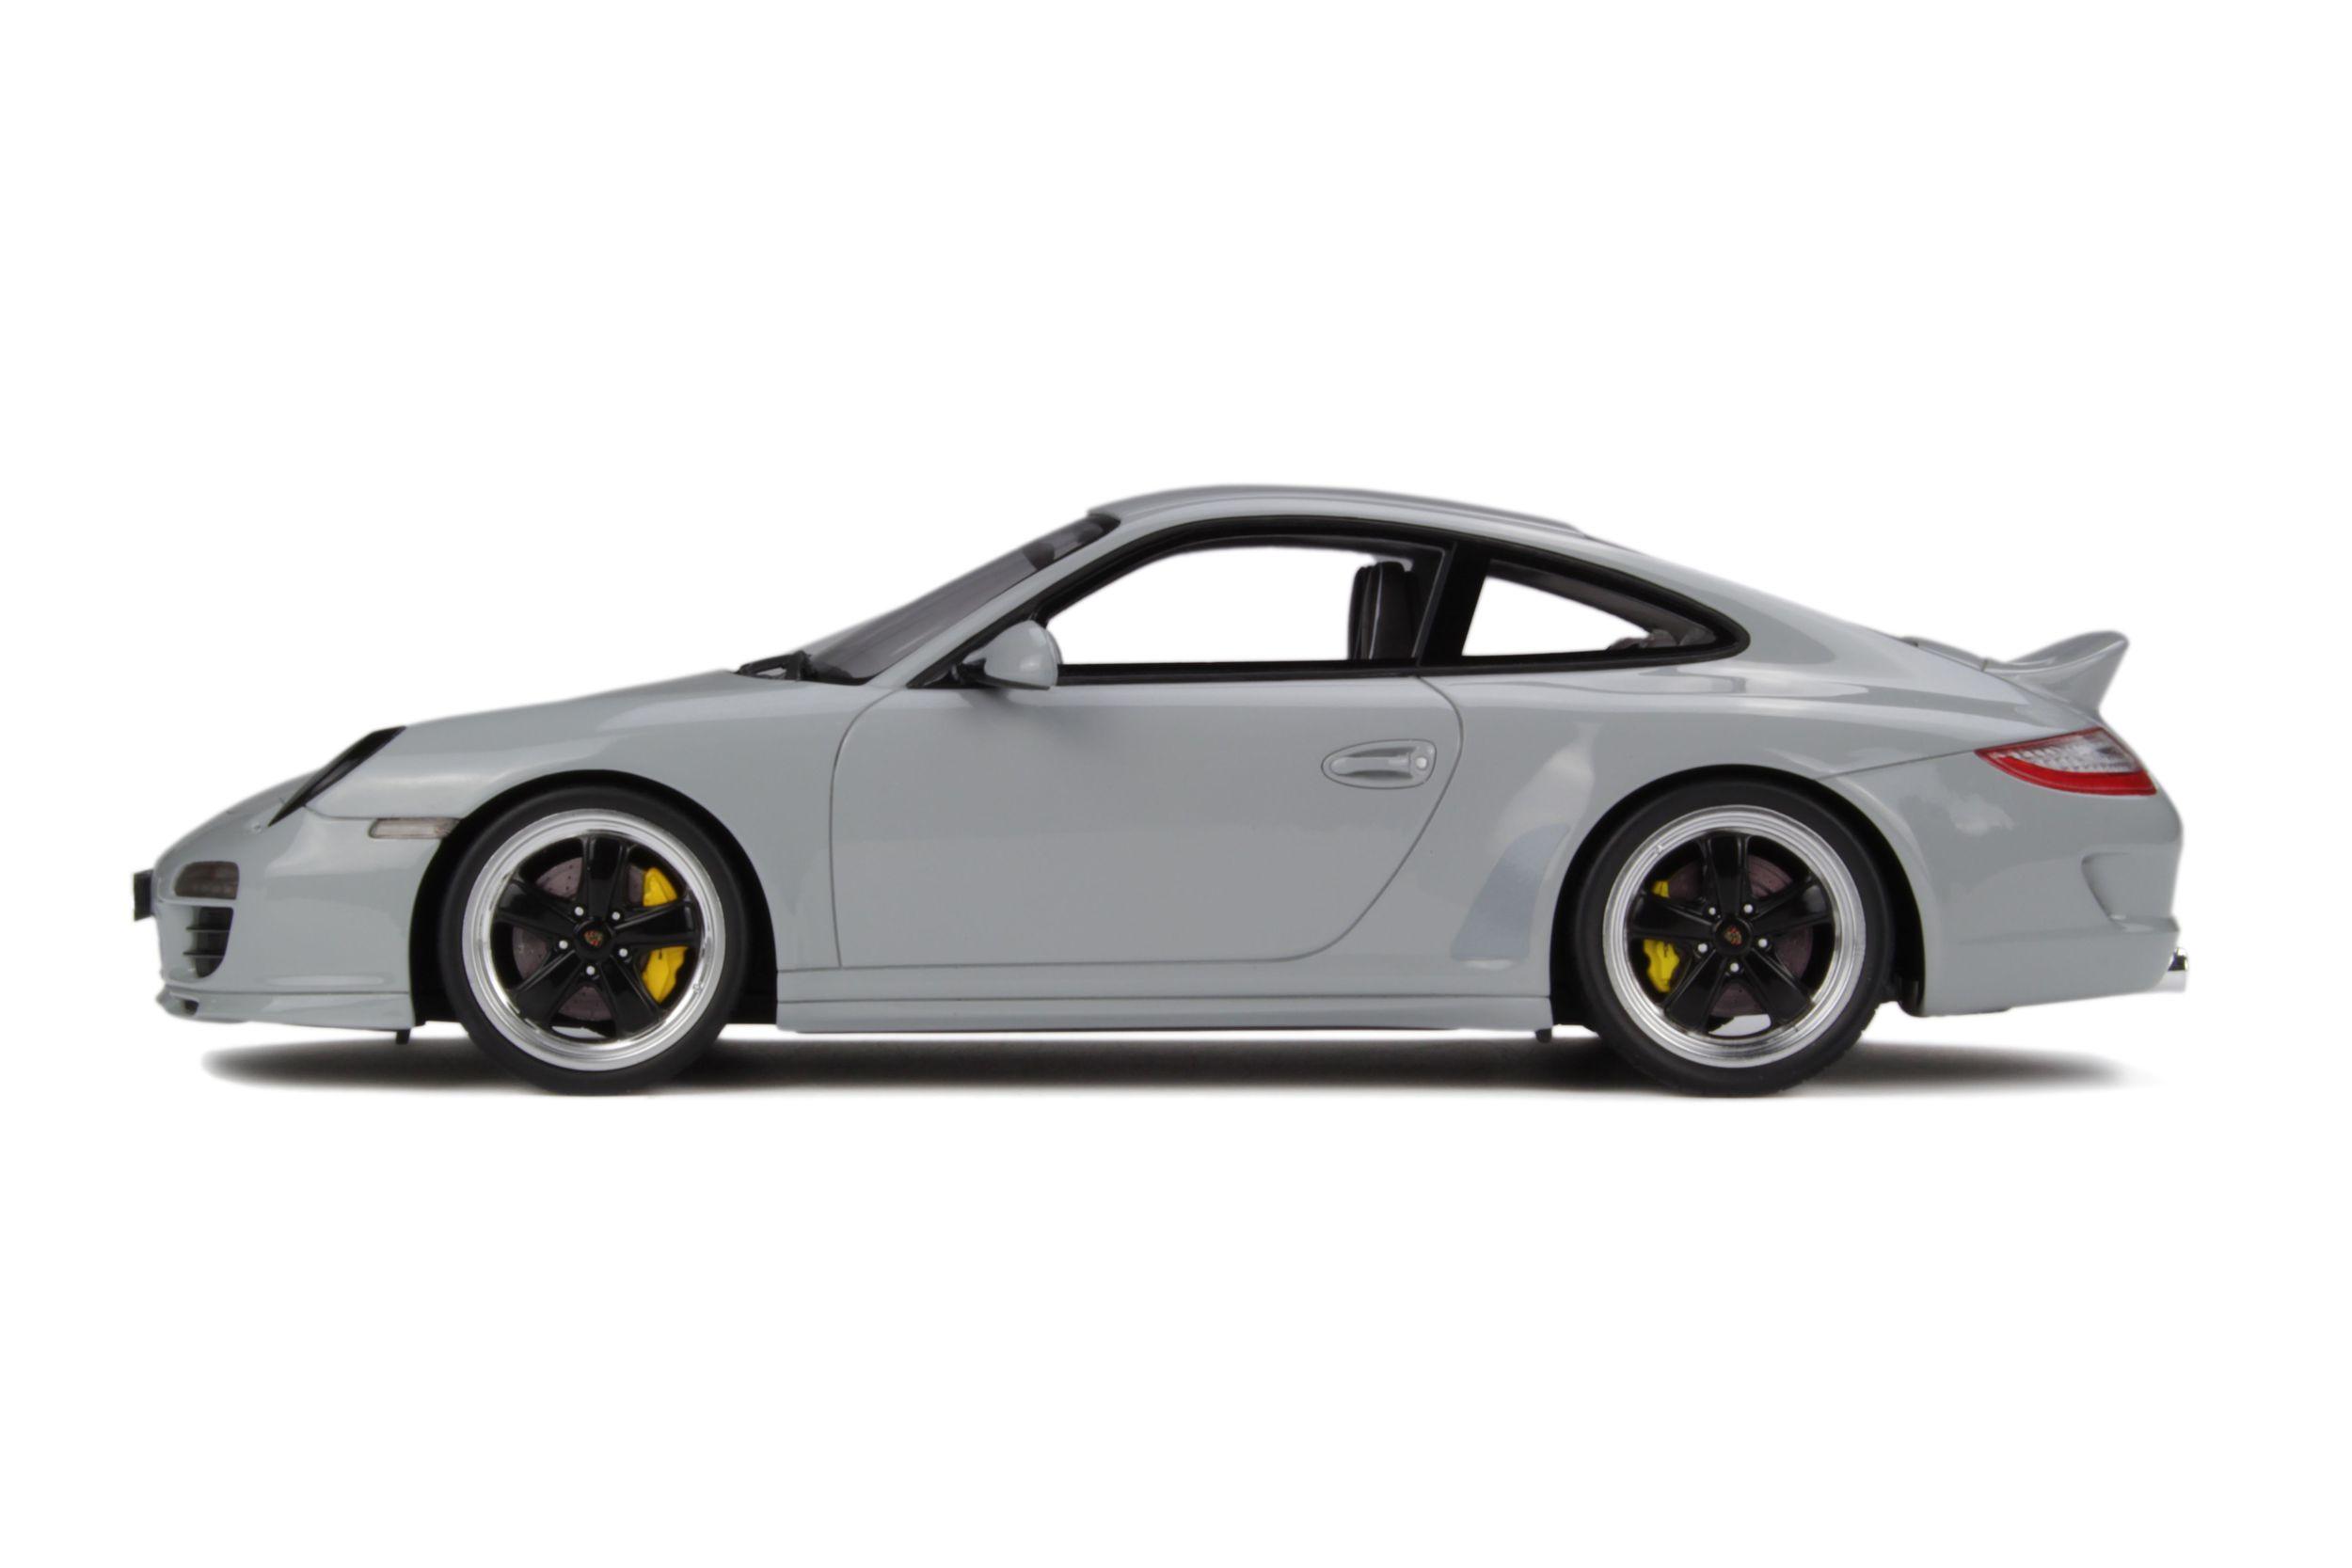 Porsche 911 997 Sport Classic Model Car Collection